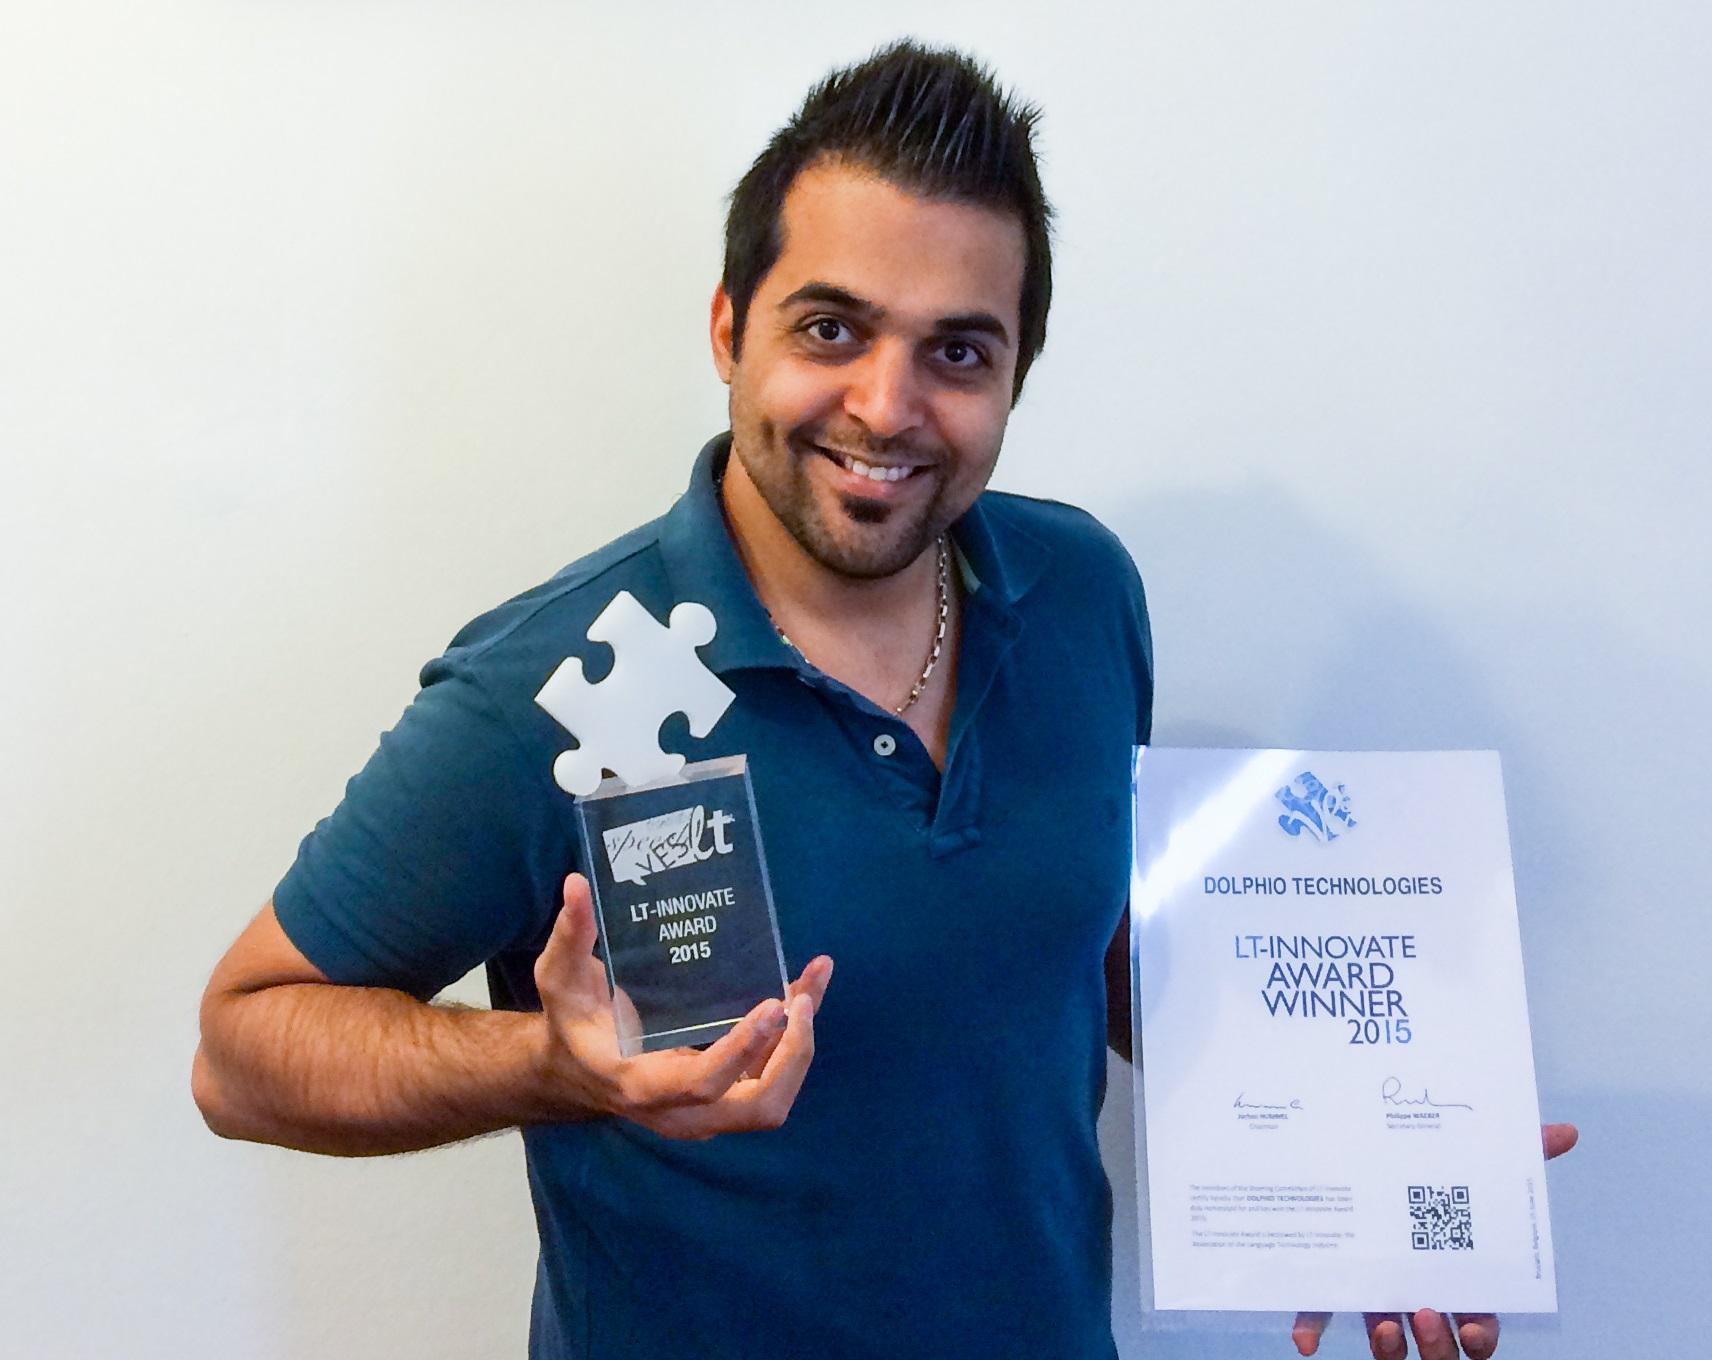 SignAll_LT_Innovate_Award